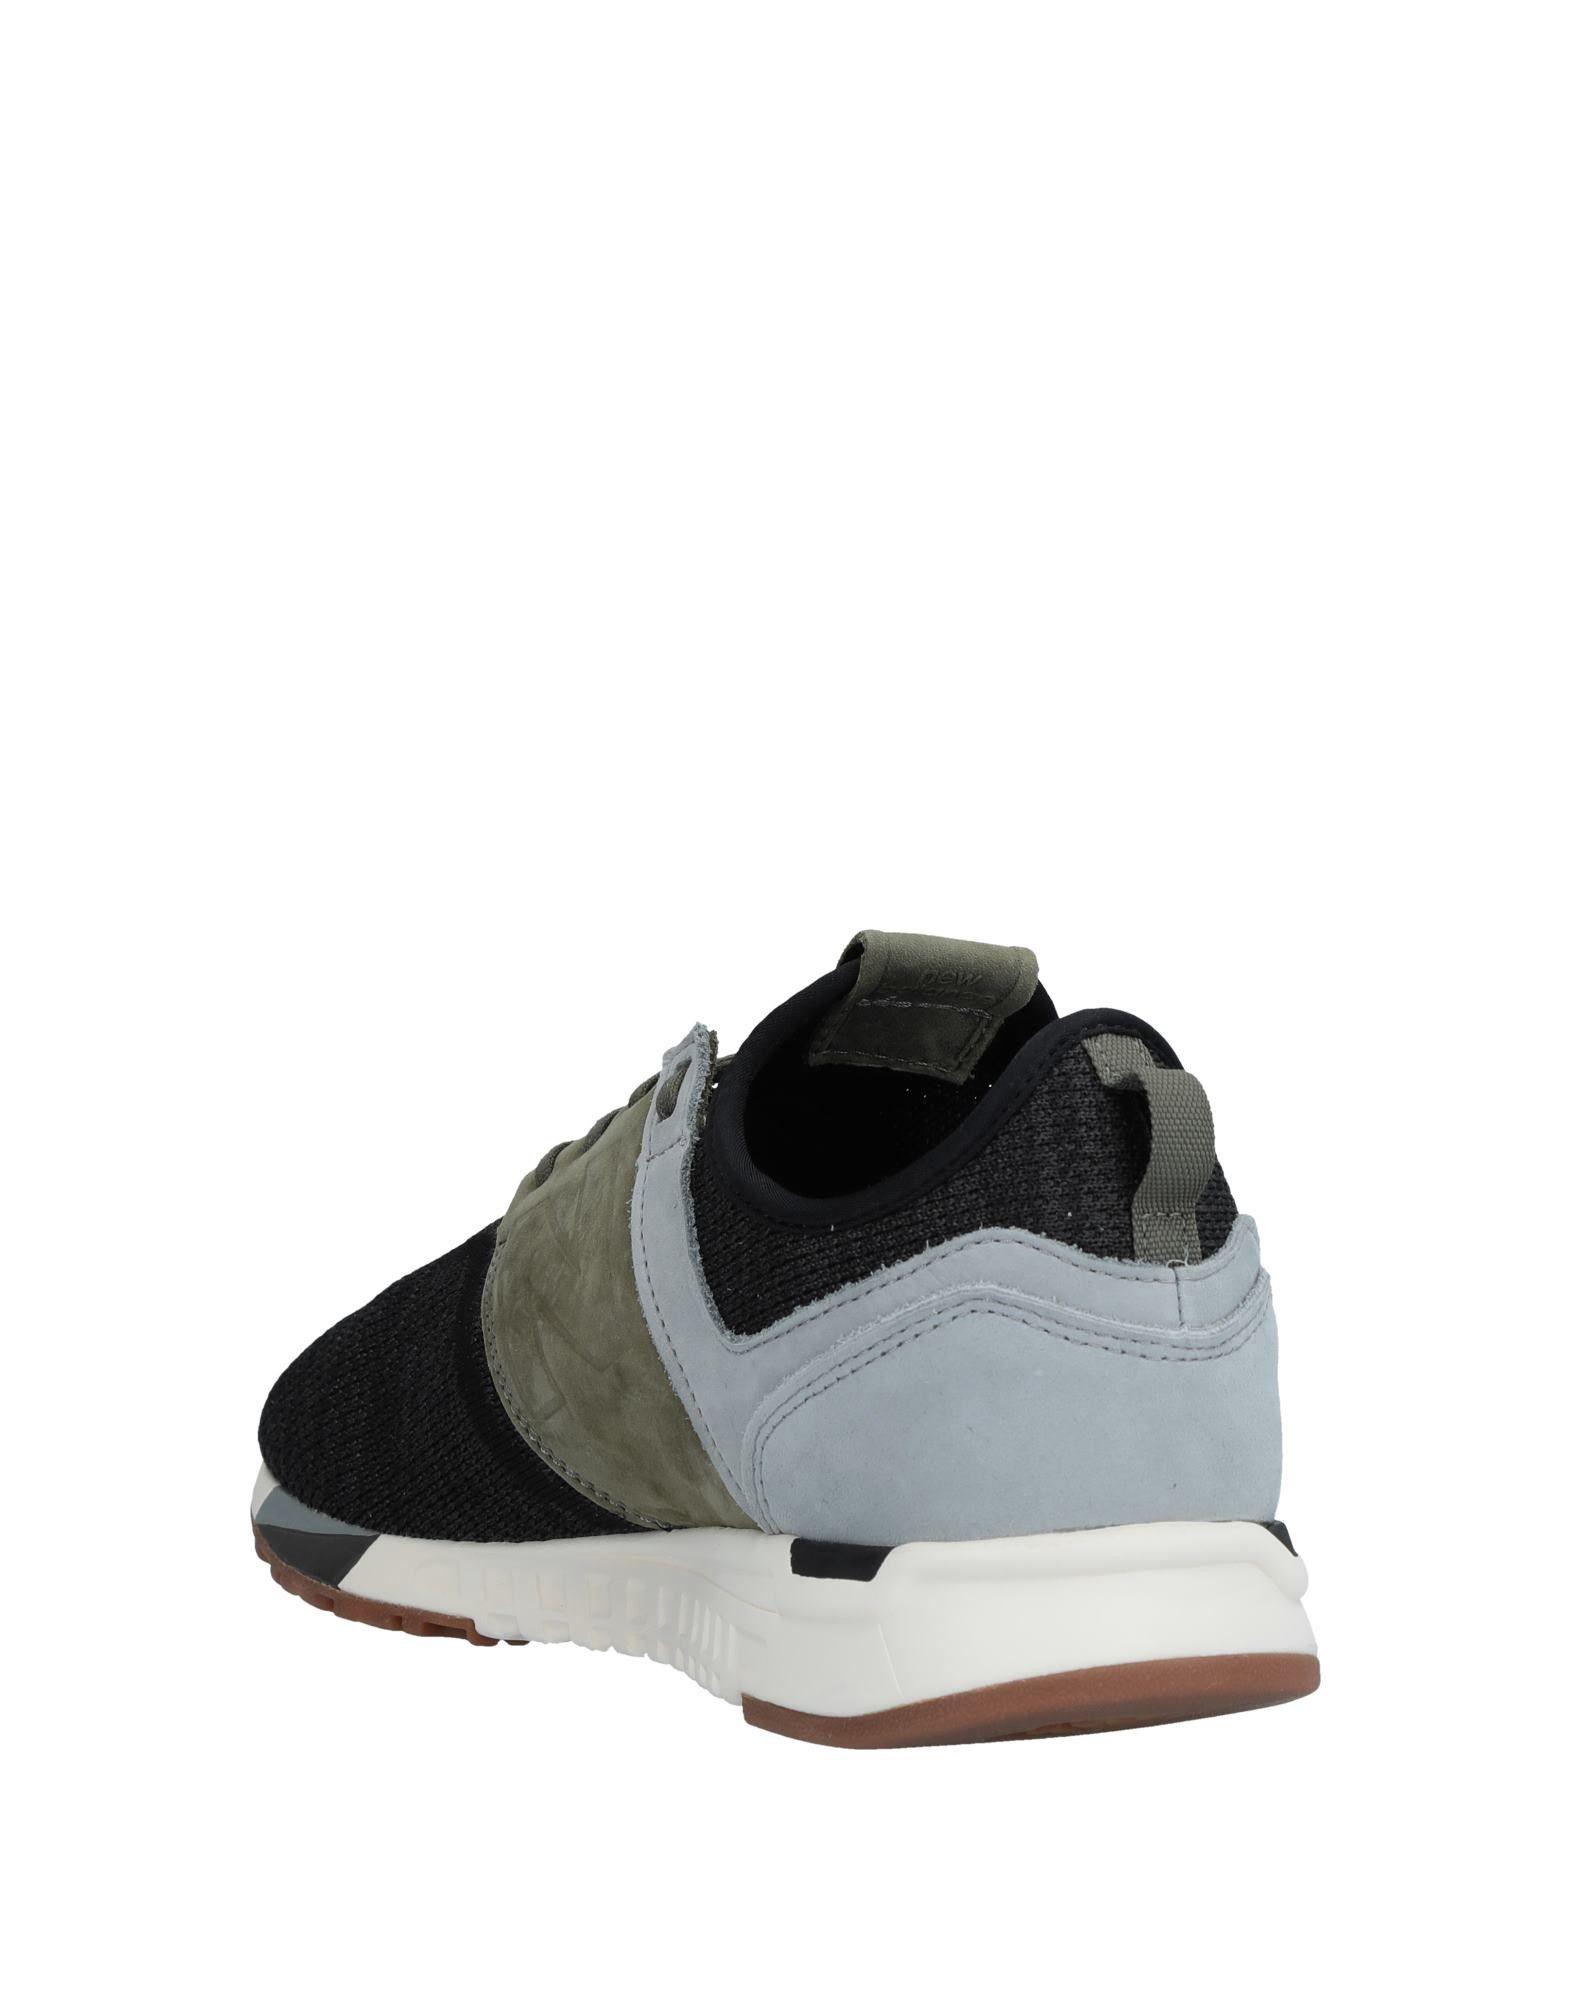 New Balance Sneakers - Men New Balance Balance Balance Sneakers online on  United Kingdom - 11527436VN 4161b4